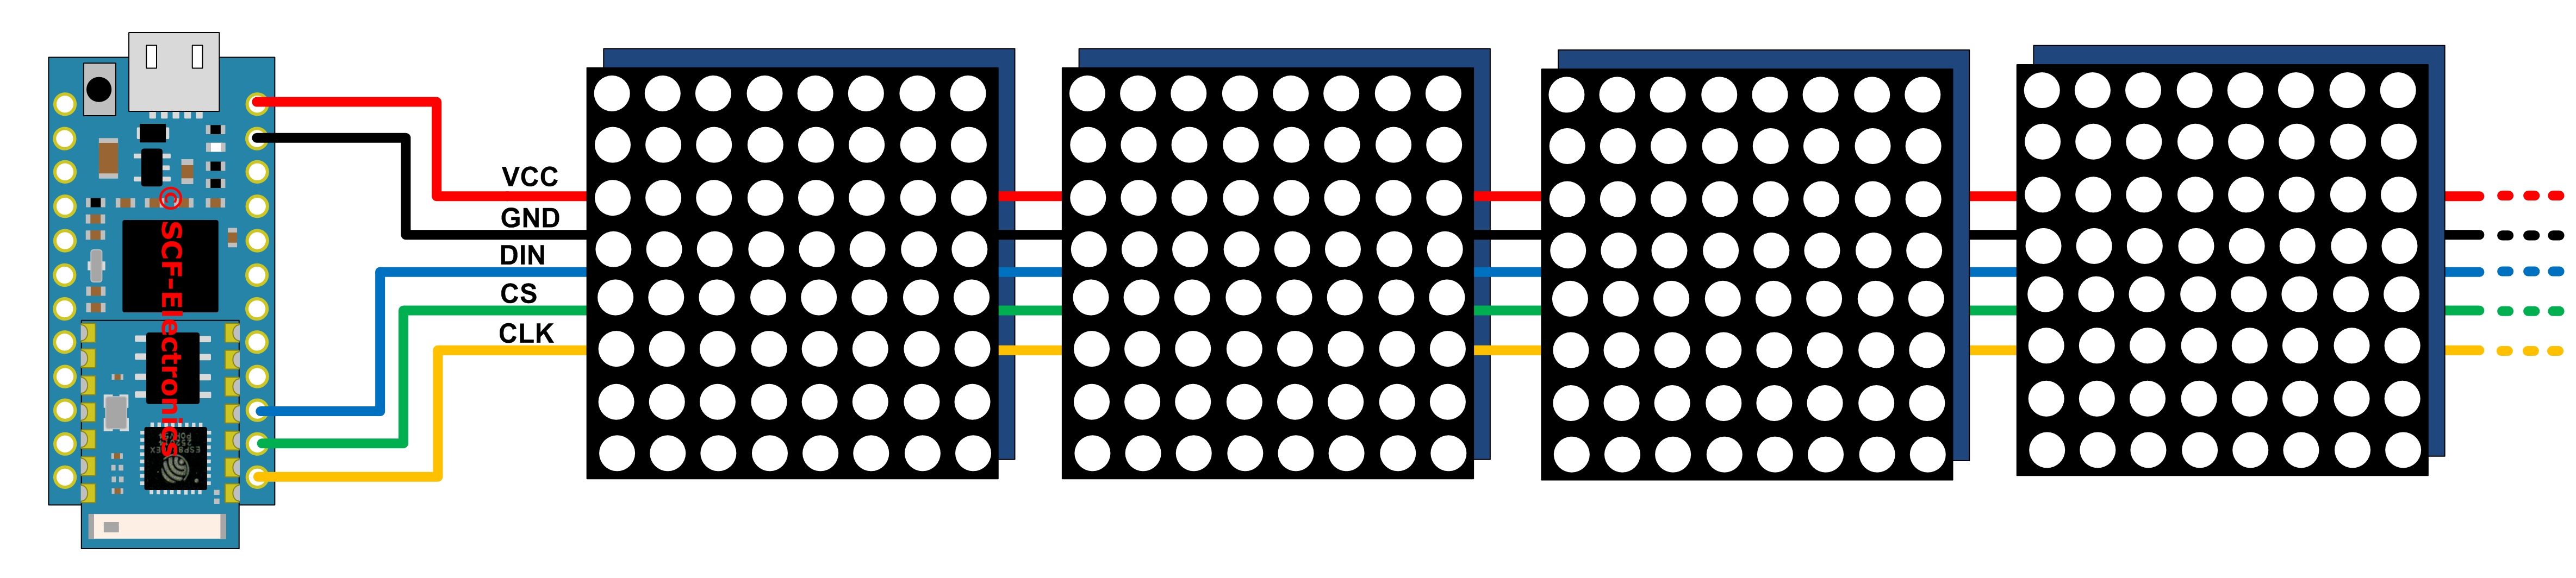 TOP03 – LED Matrix Display – uPanel